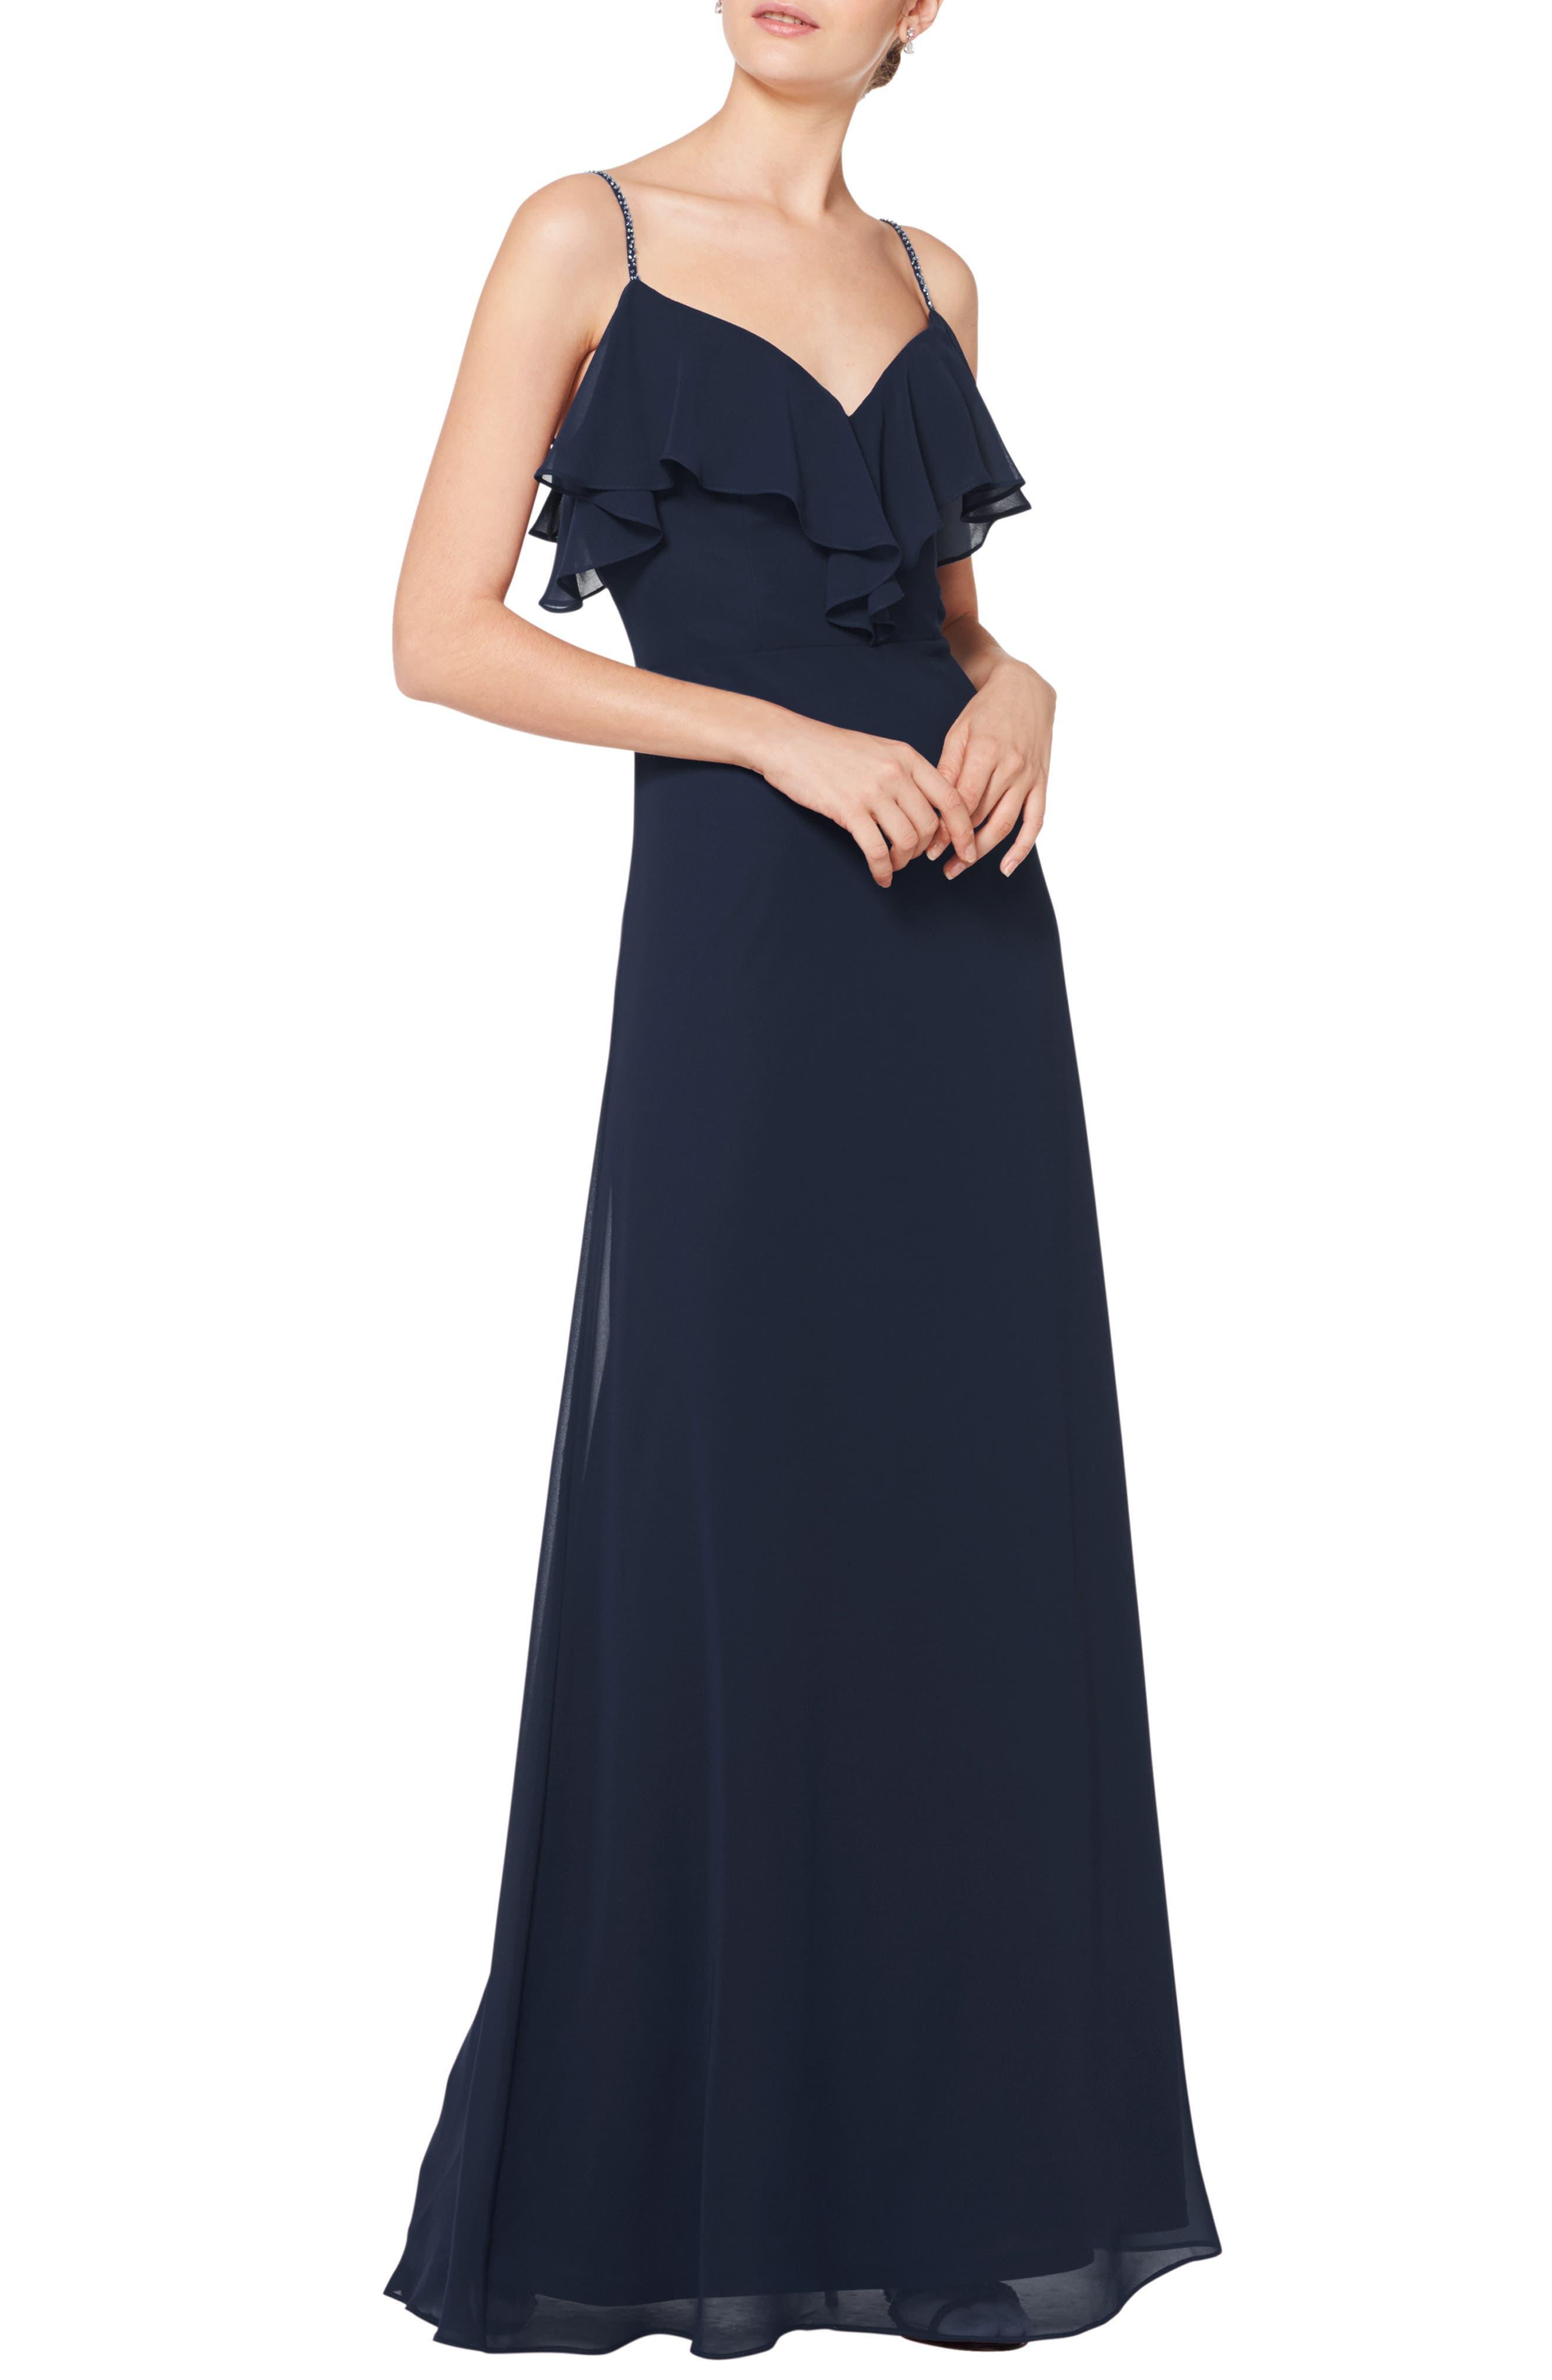 #LEVKOFF, Jeweled Strap Ruffle Neck Chiffon Gown, Main thumbnail 1, color, NAVY